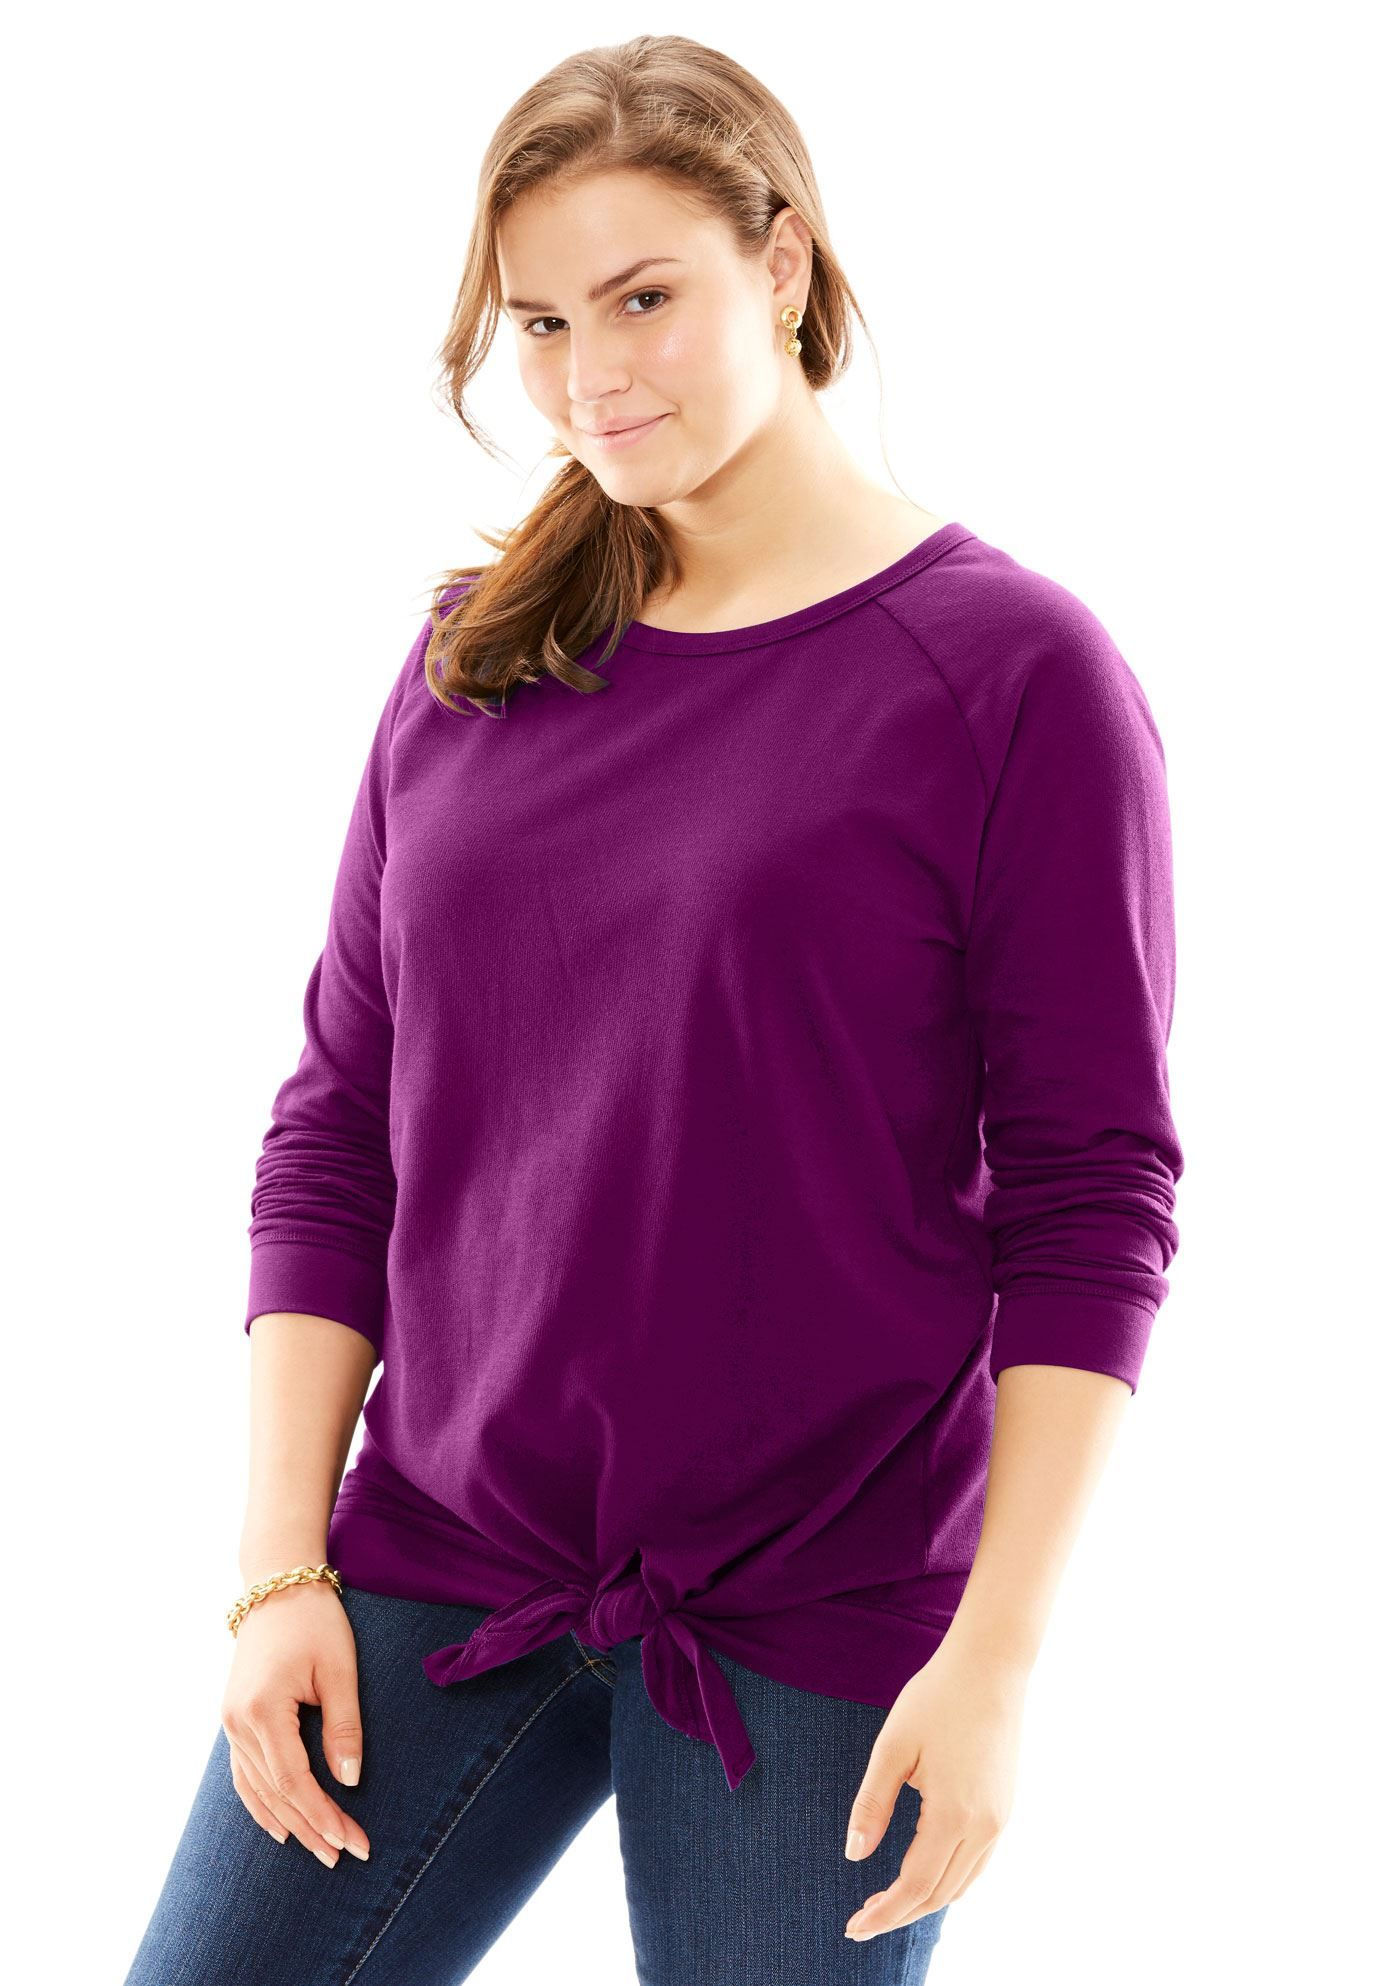 Tie-Front Sweatshirt - Women's Plus Size Clothing